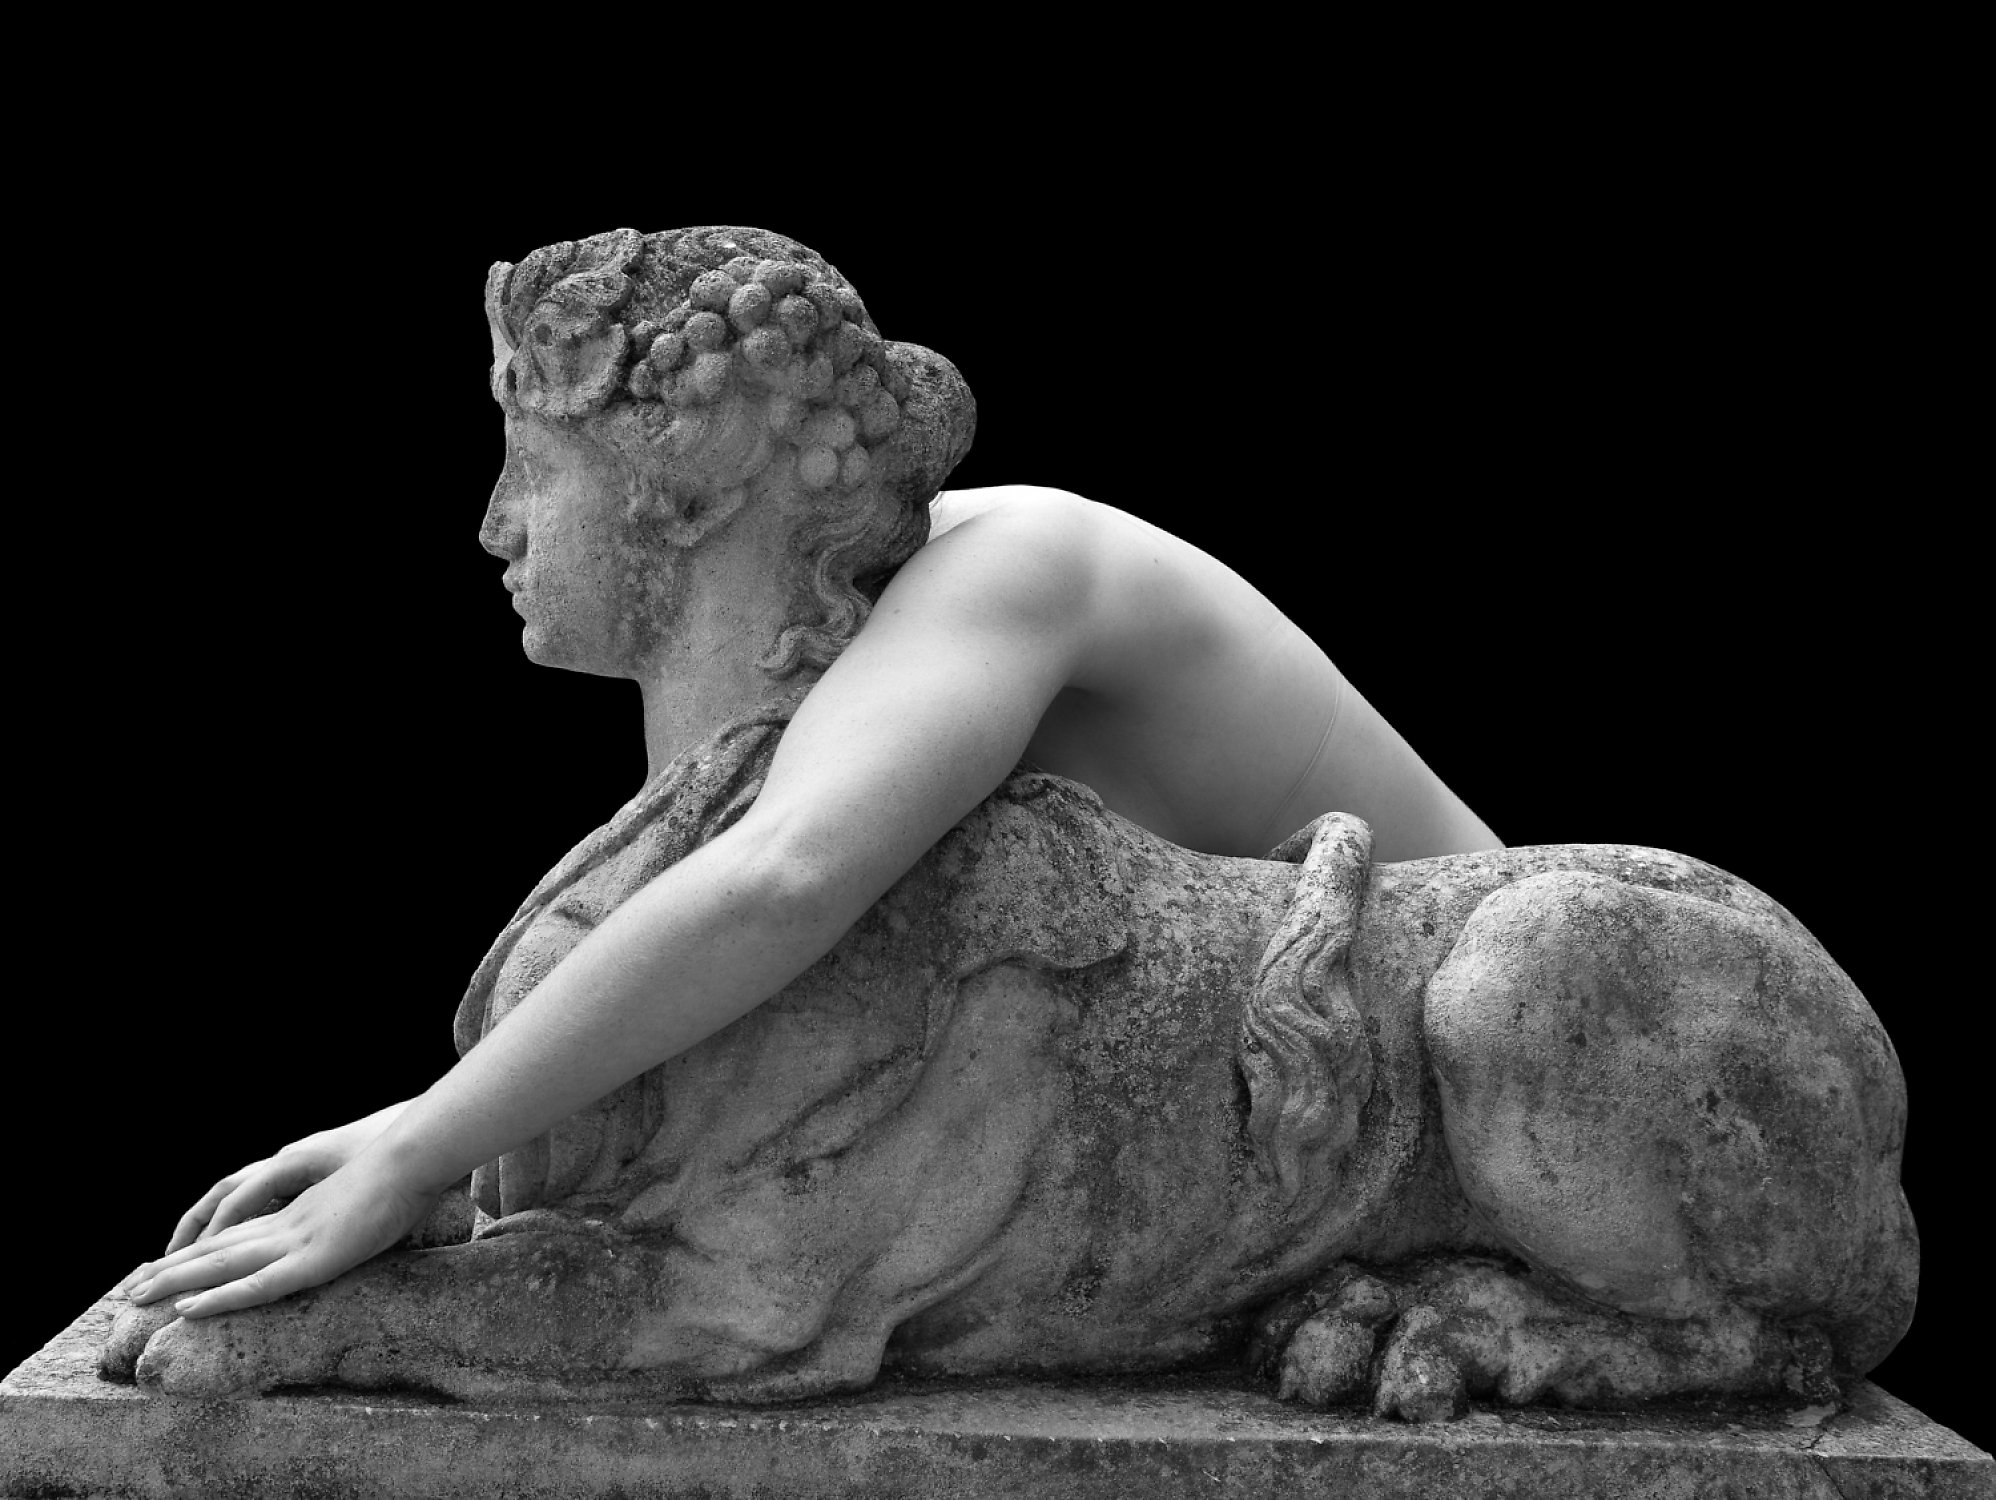 Viviane Sassen, «Venus & Mercury», Huis Marseille Muséum Amsterdam. Courtesy Viviane Sassen 2019.